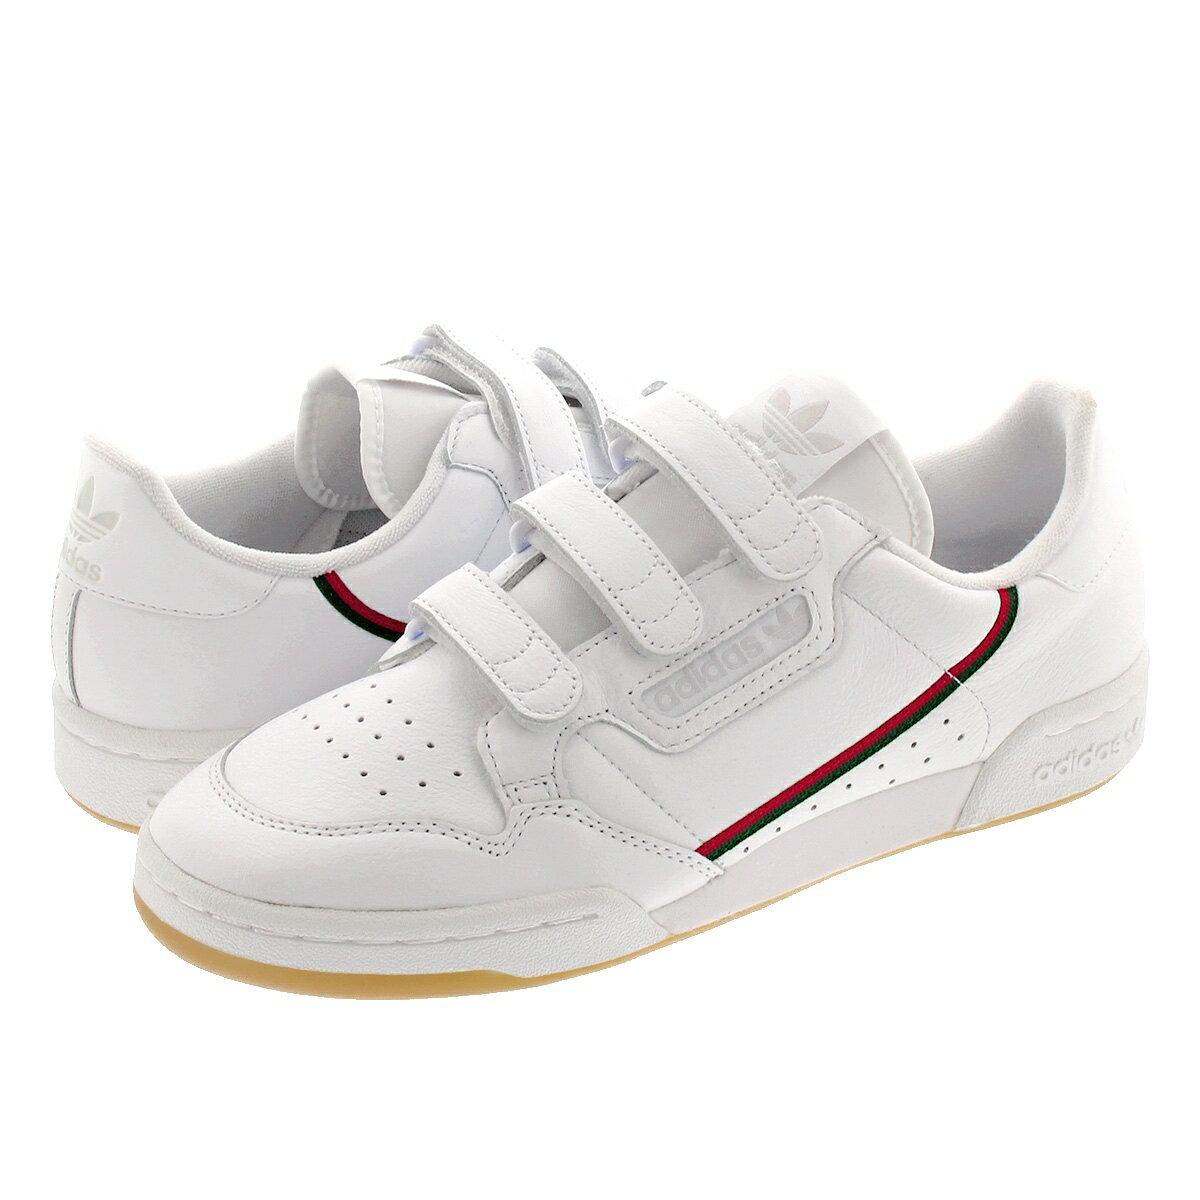 adidas CONTINENTAL 80 STRAP Adidas Continental 80 strap RUNNING  WHITE/COLLEGIATE GREEN/SCARLET ee5359